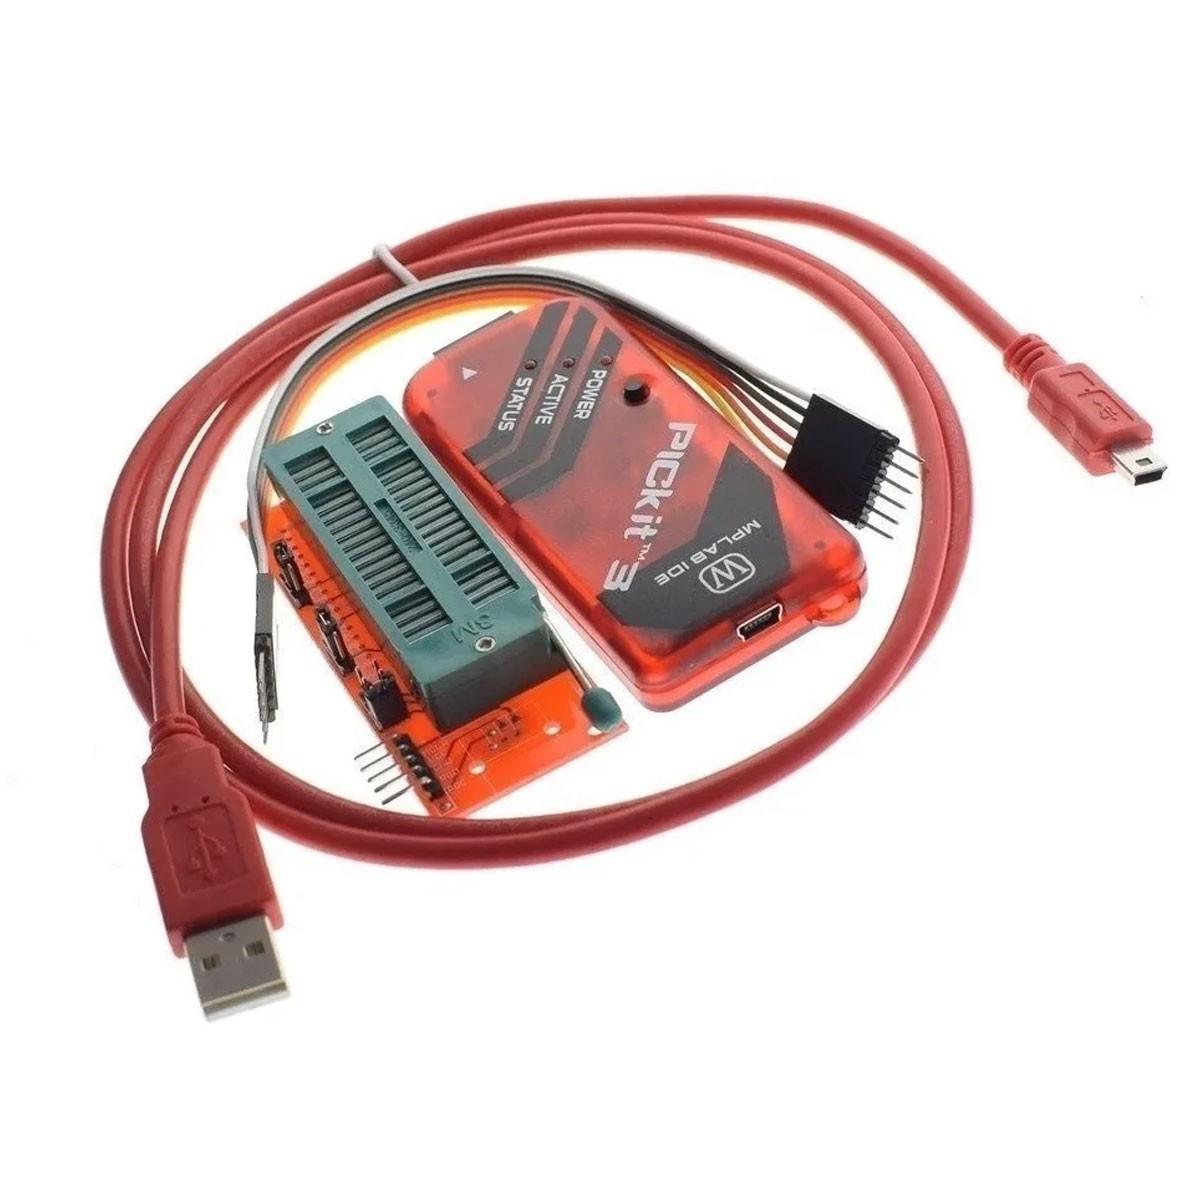 Programador Kit3 Pickit-3 Gravador de Pic + Adaptador ZIF 40 Pinos